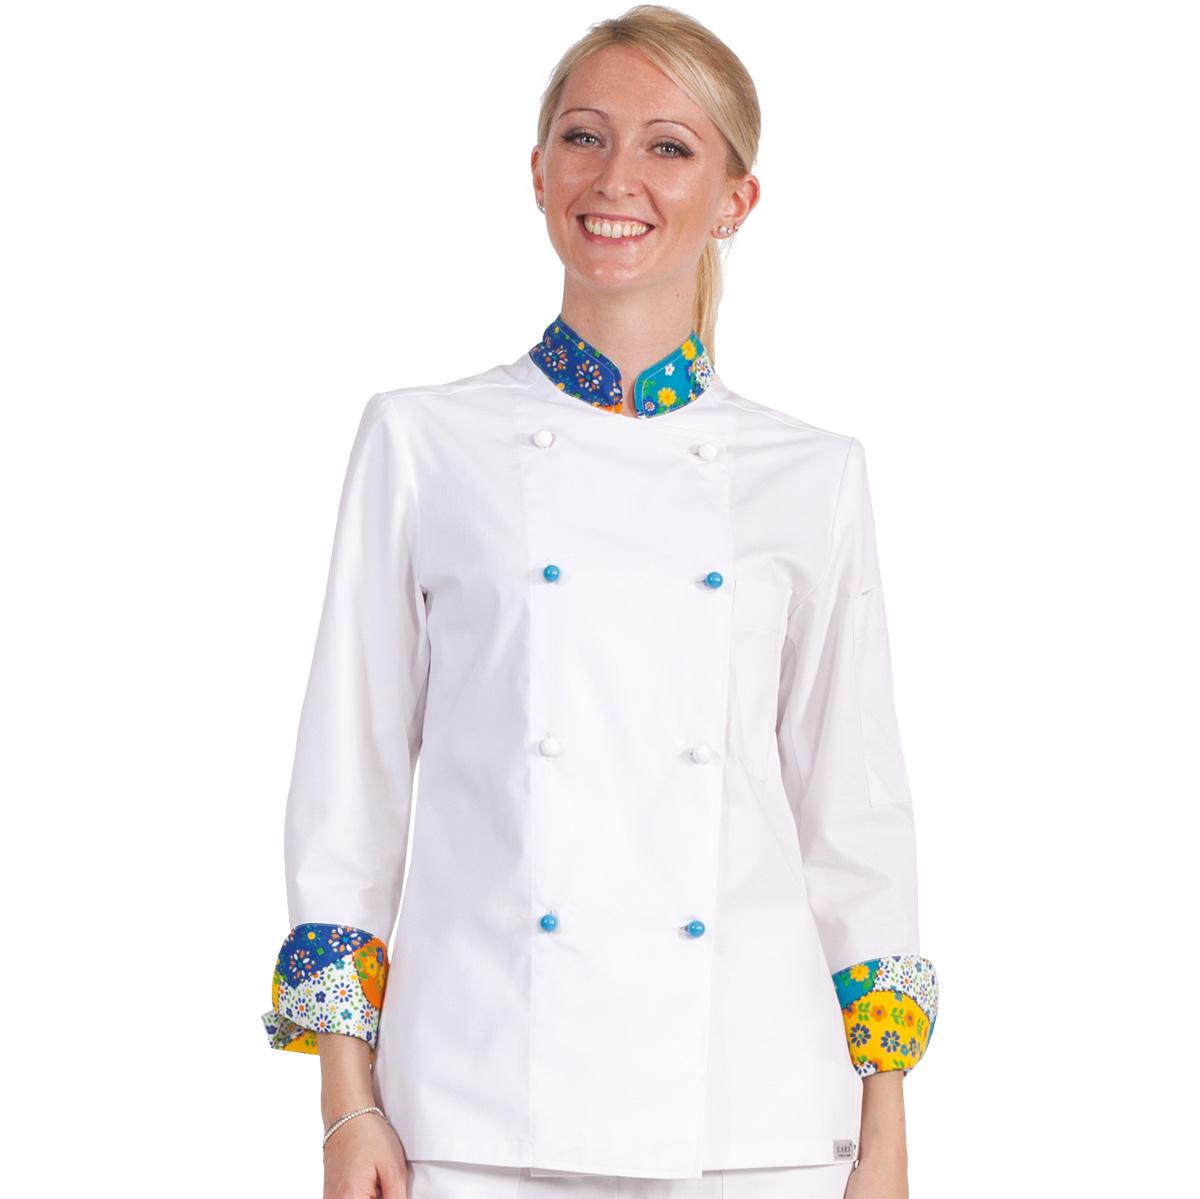 evolution-giacca-cuoco-donna-fantasia